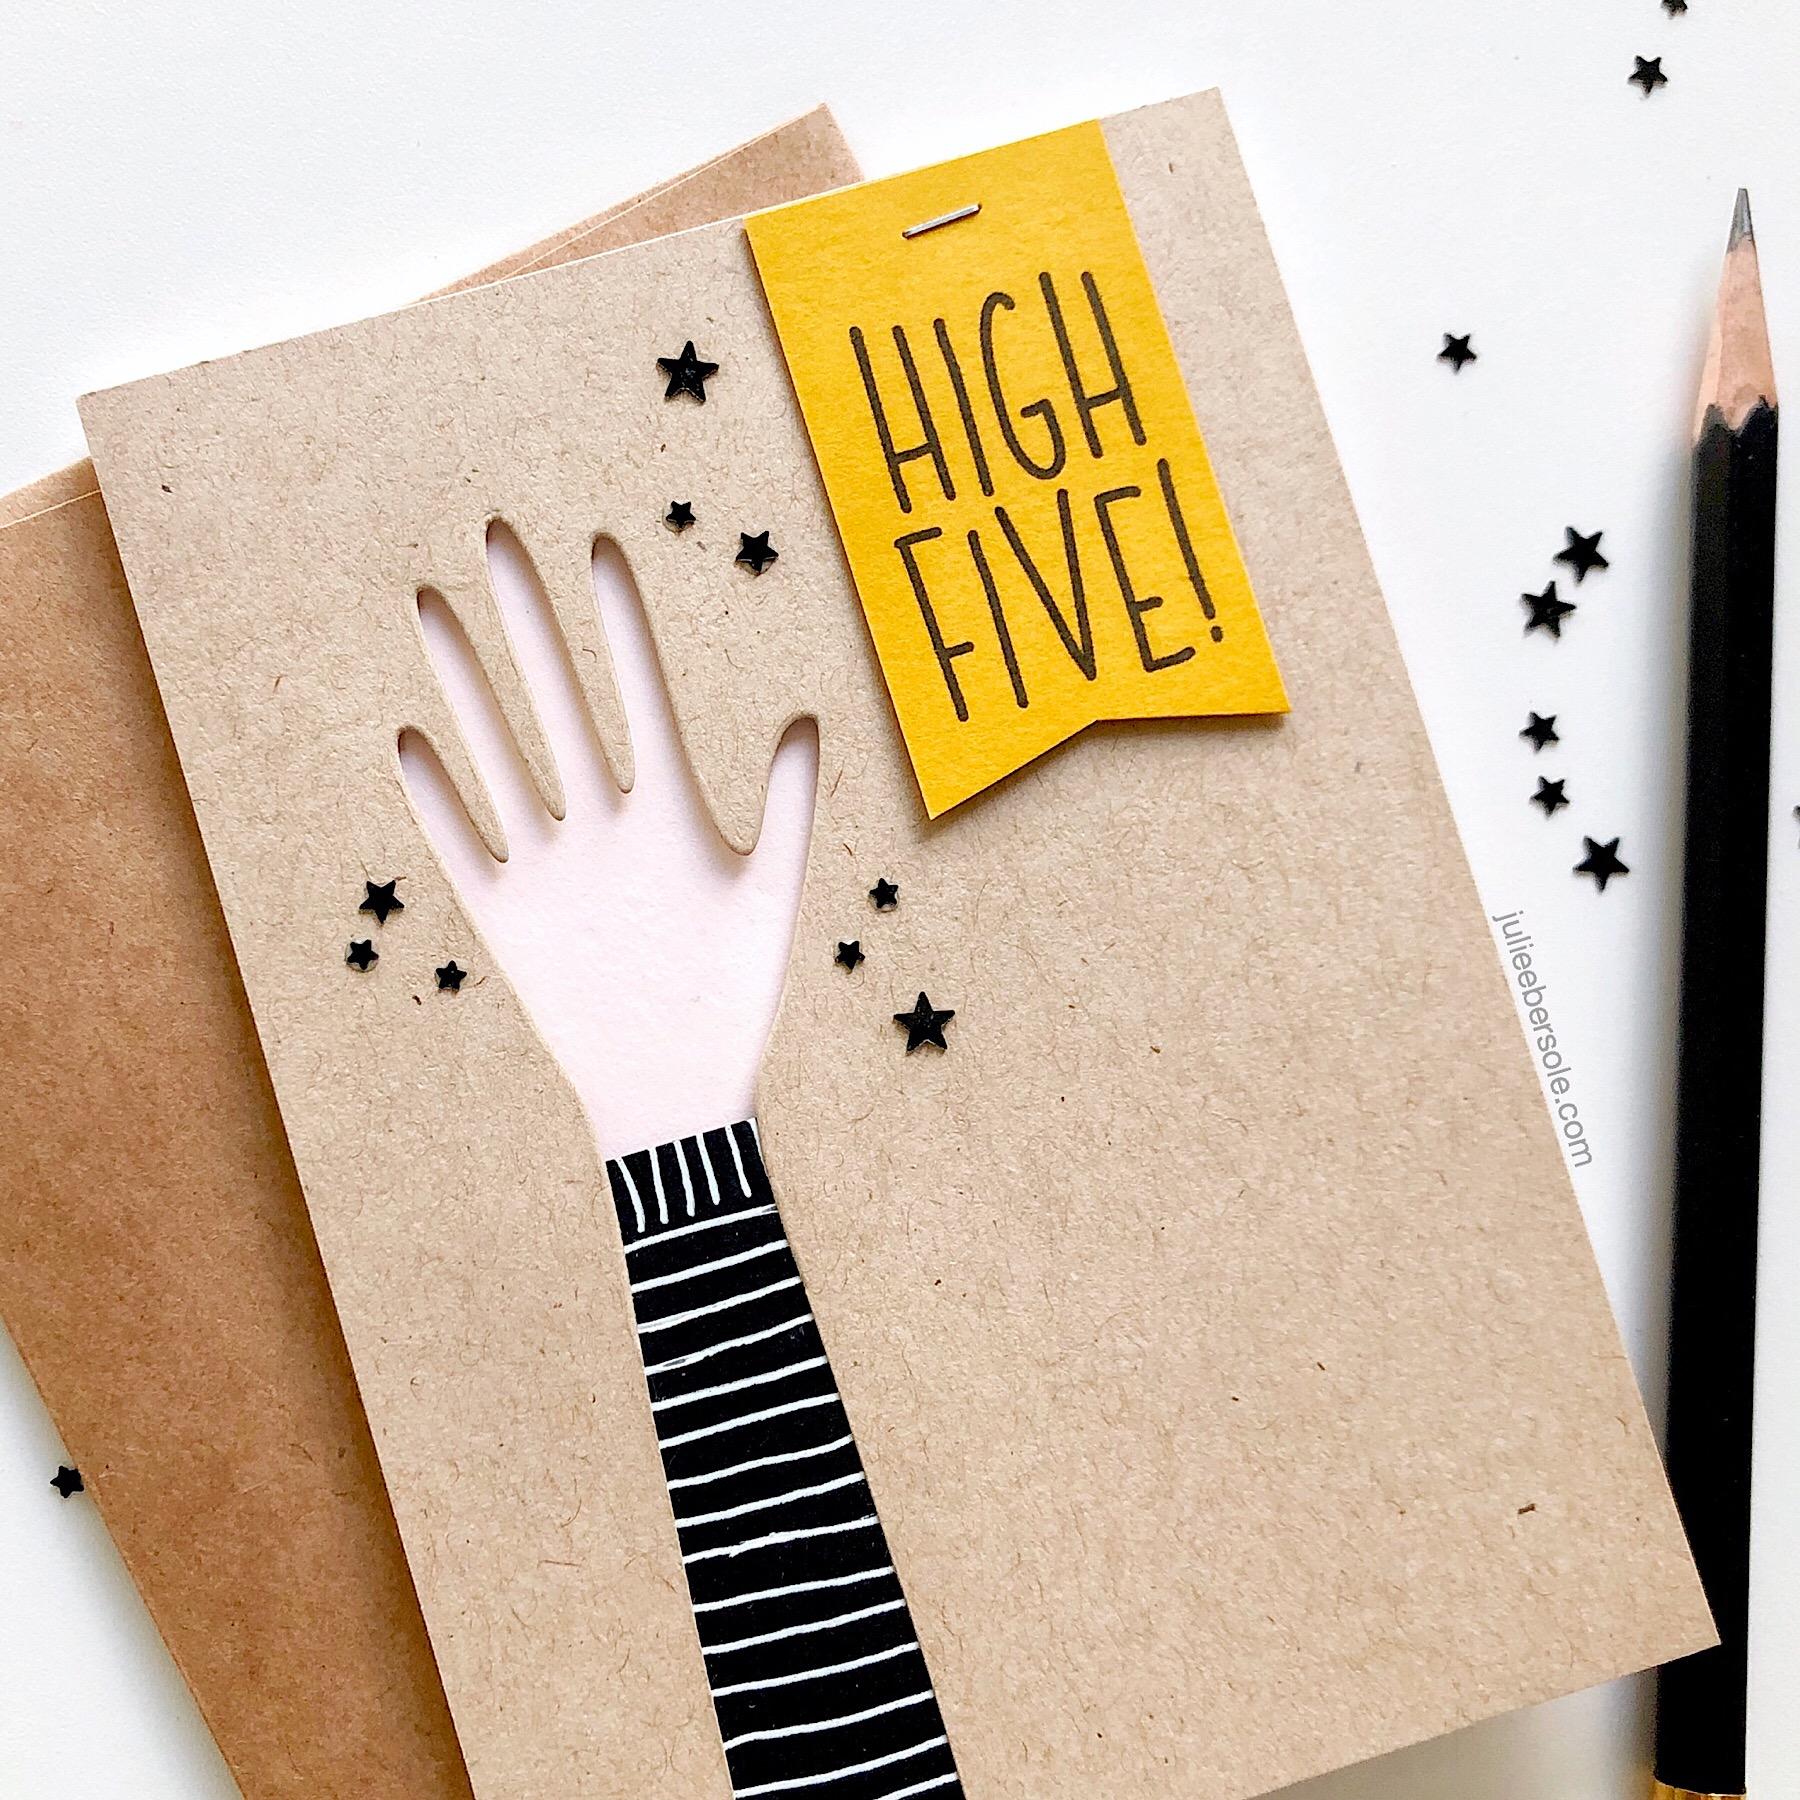 tall-high-five-001-2.jpg